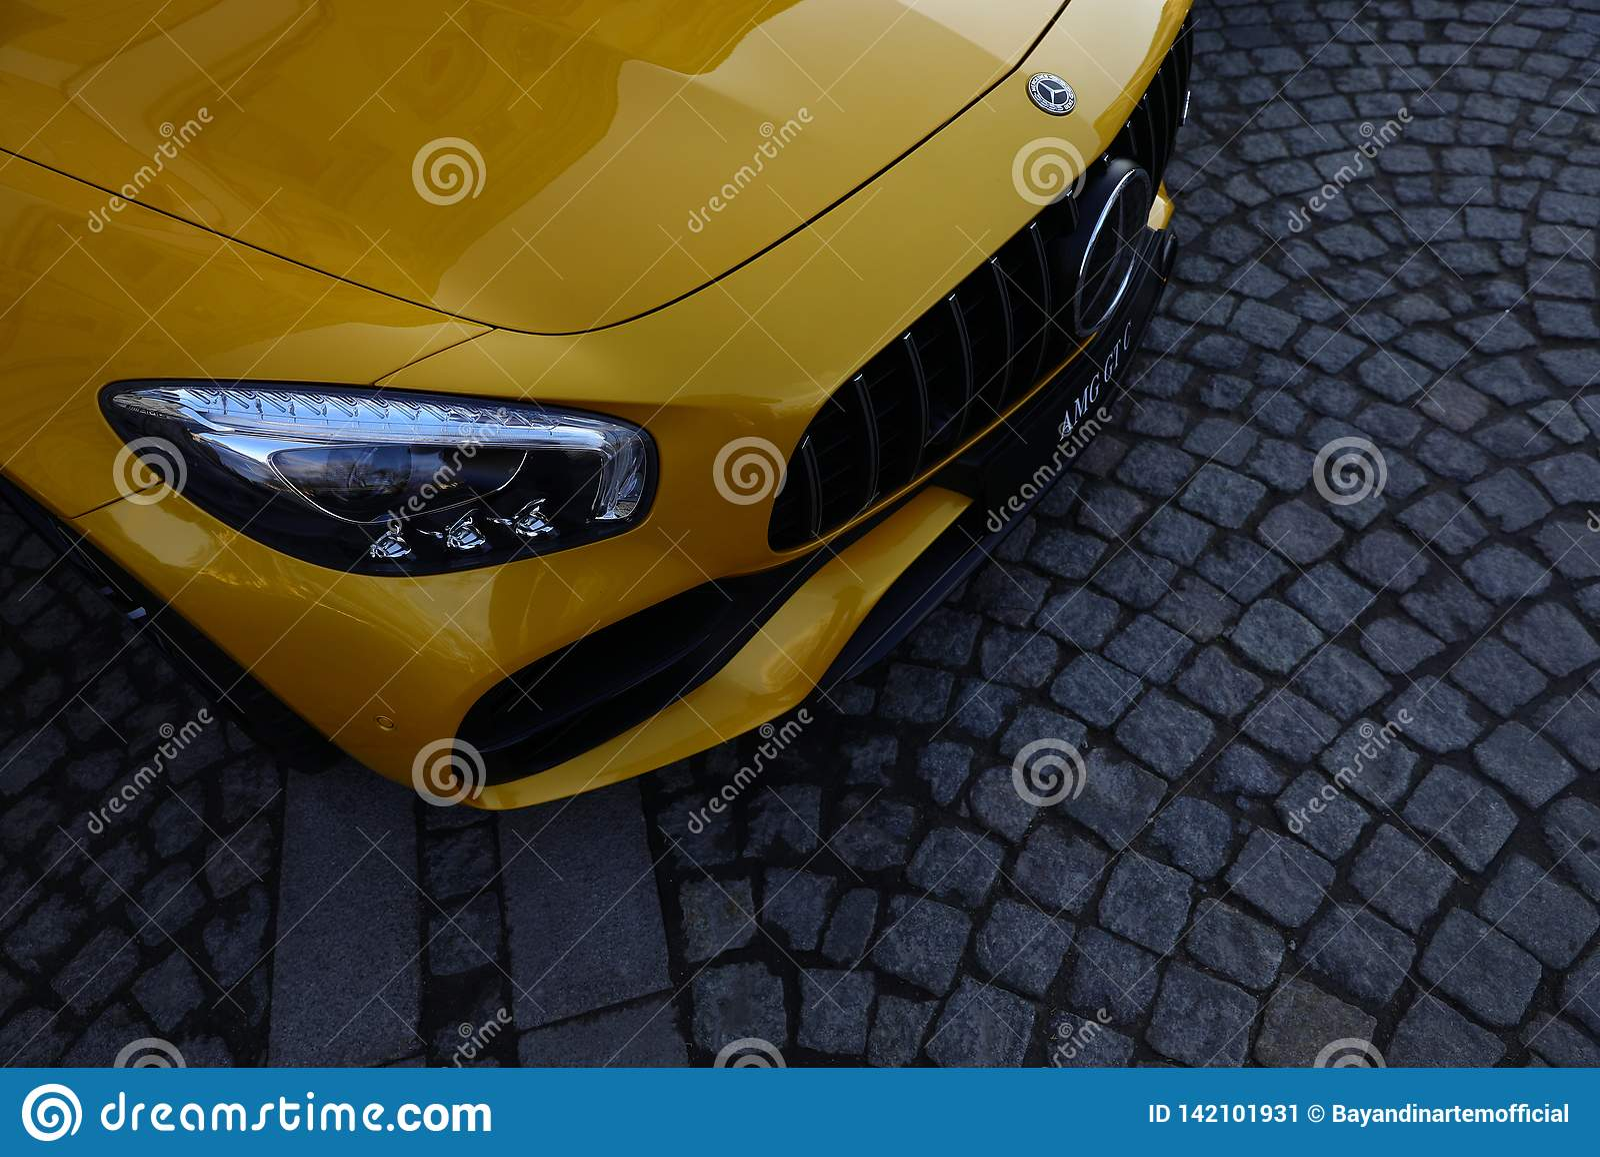 Mercedes-Benz AMG GT C Yellow